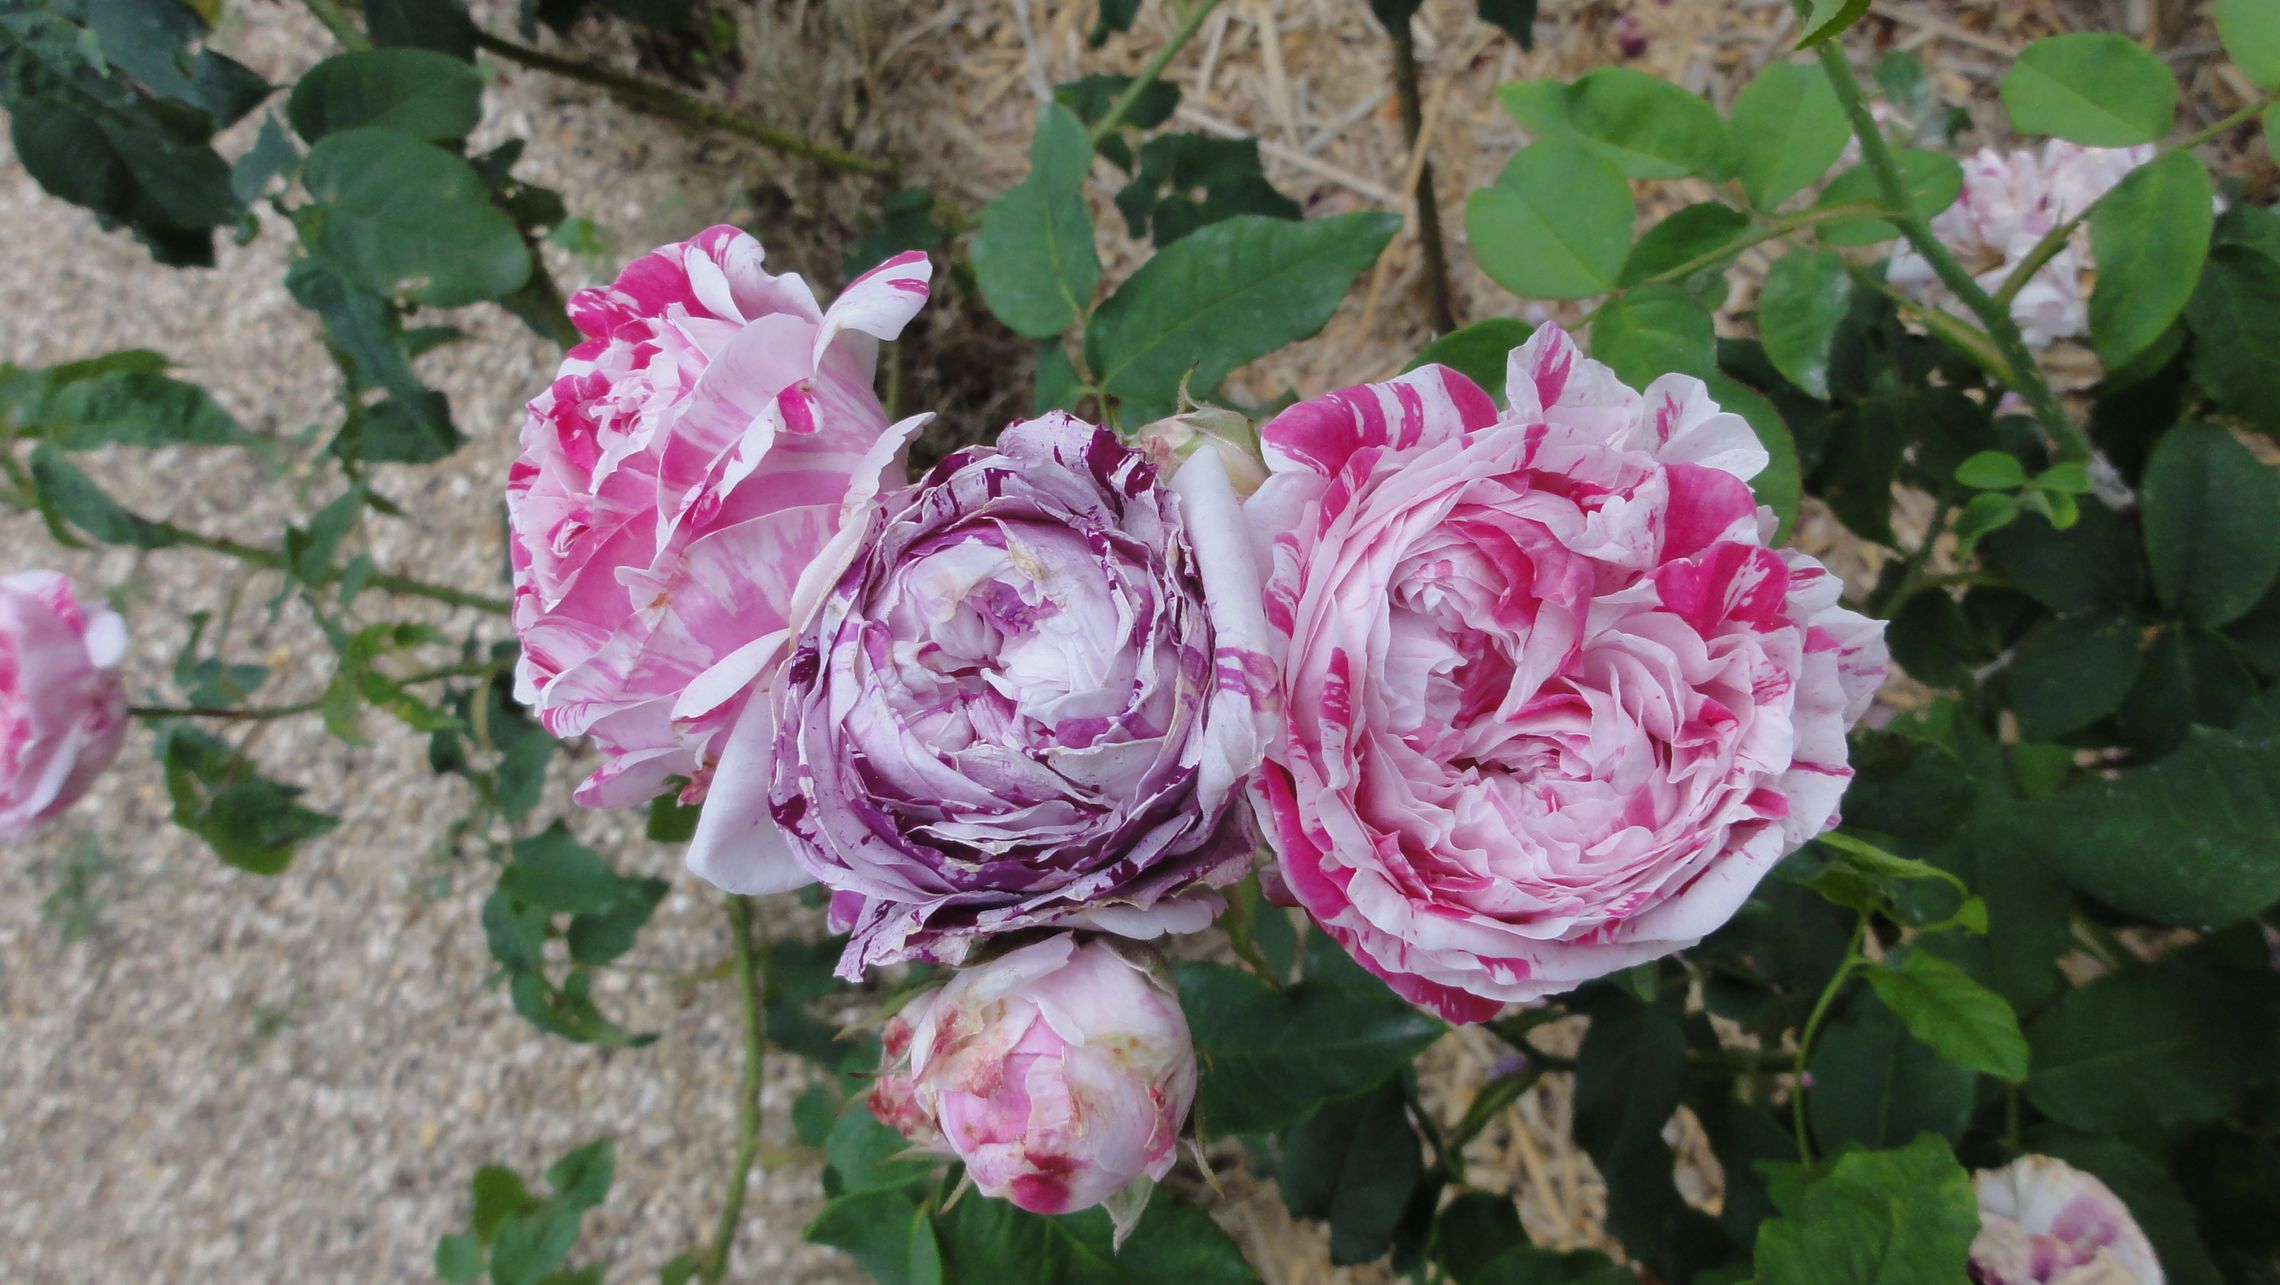 20170602 roseraie vdm 19